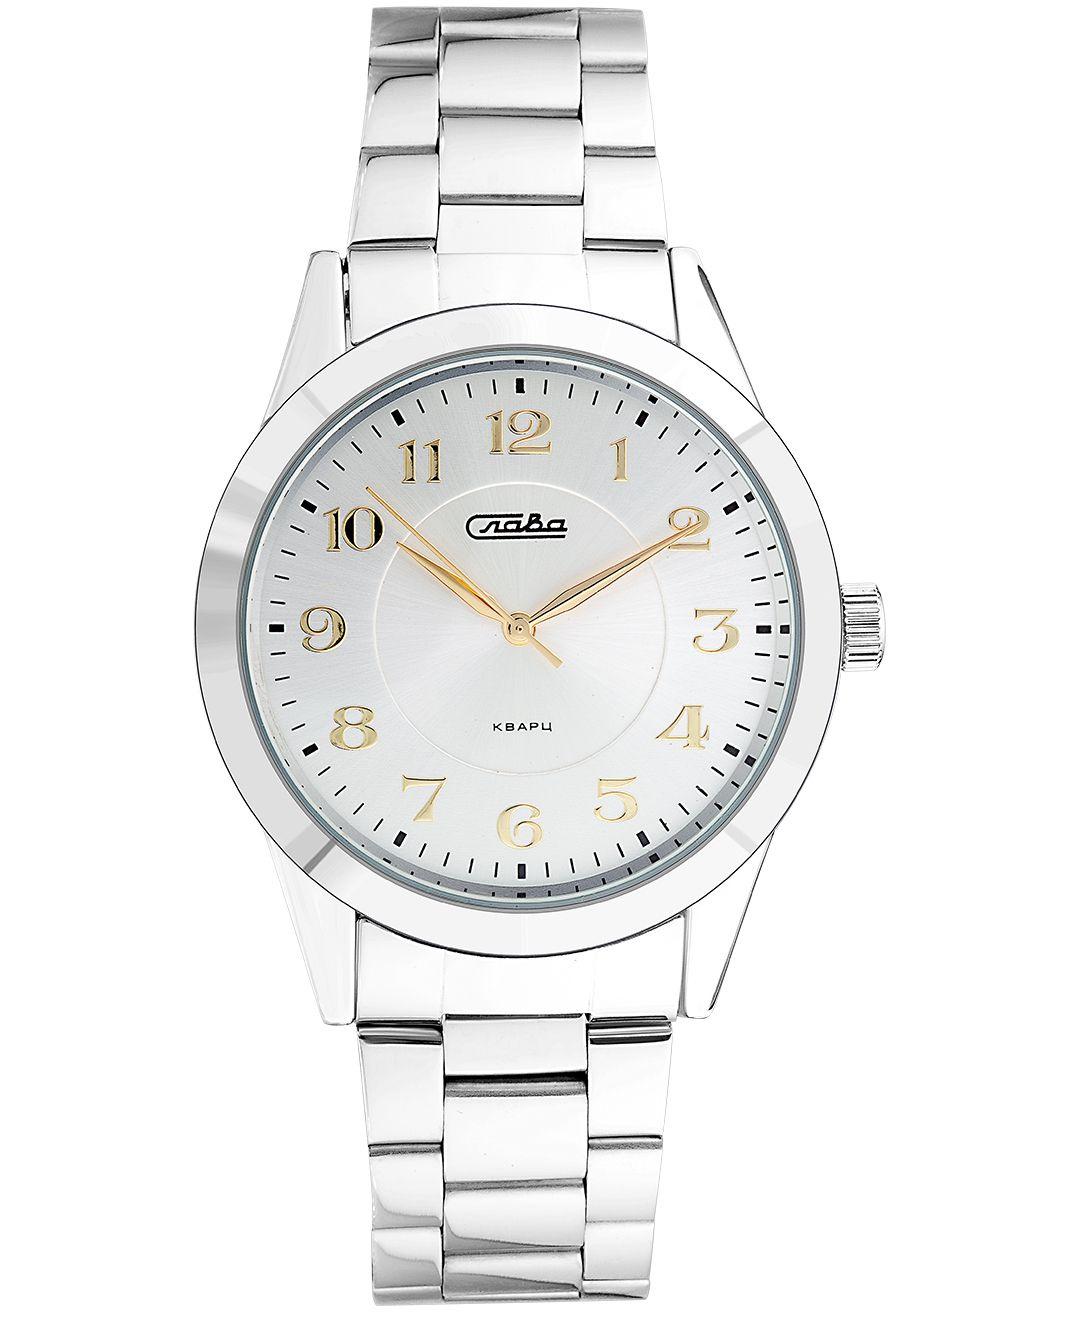 Часы Слава Традиция, 1731986/2035-100, белый, серебристый все цены